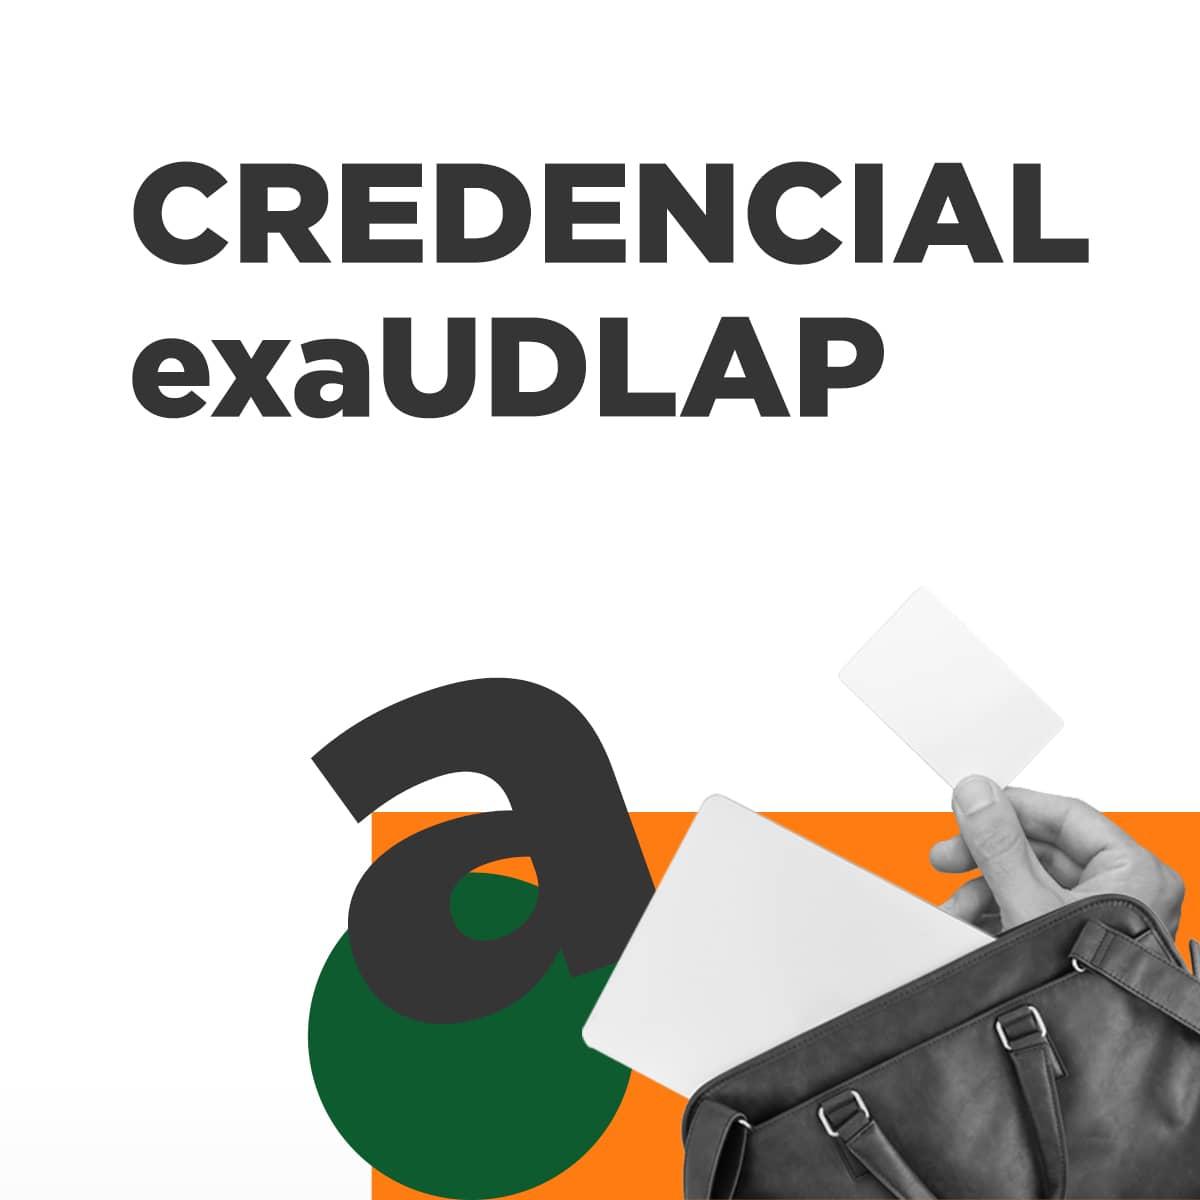 Credencial ExaUDLAP